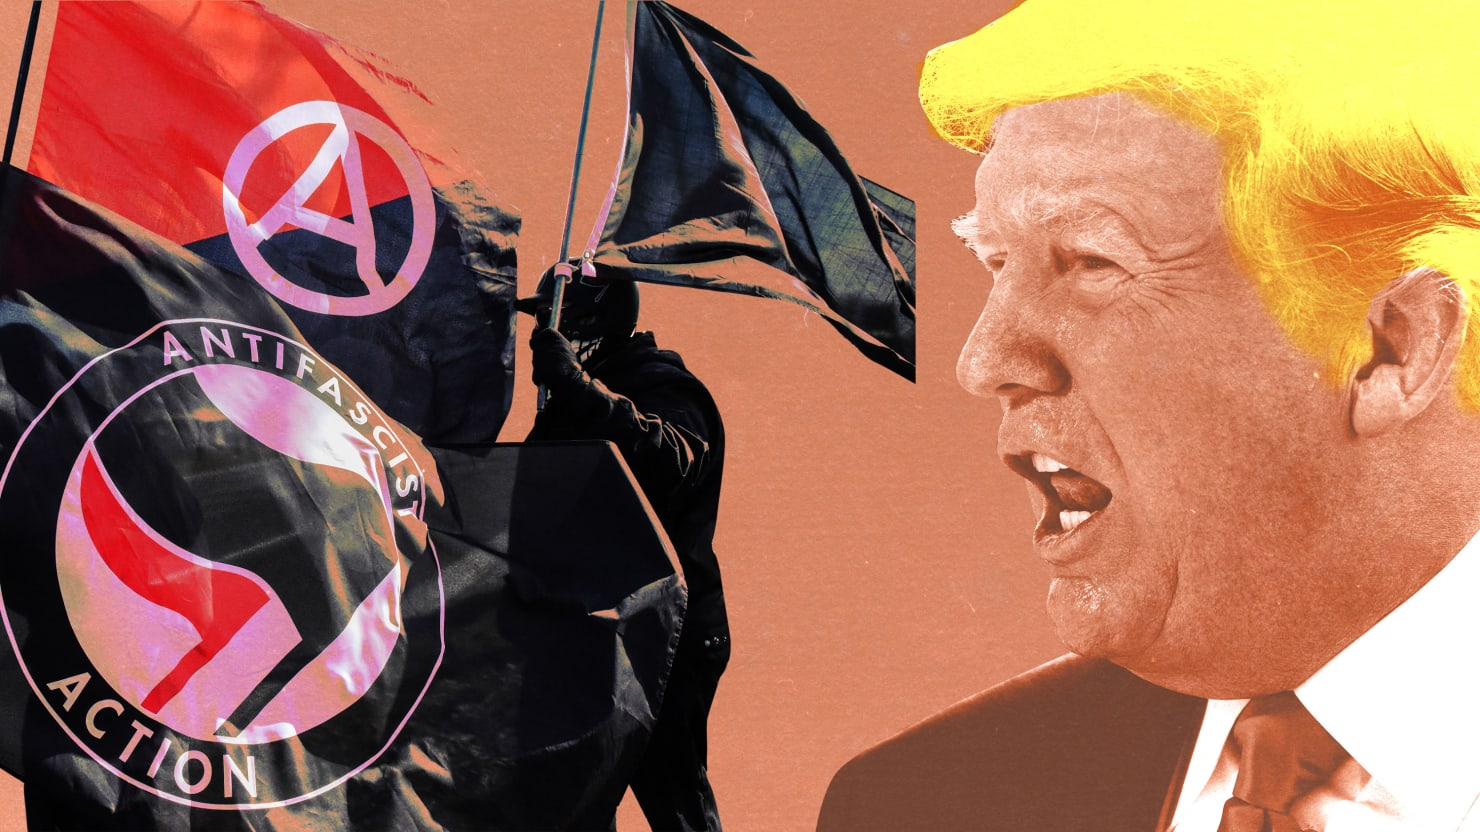 Trump's 'ANTIFA' Threat Is Total Bullshit—And Totally Dangerous